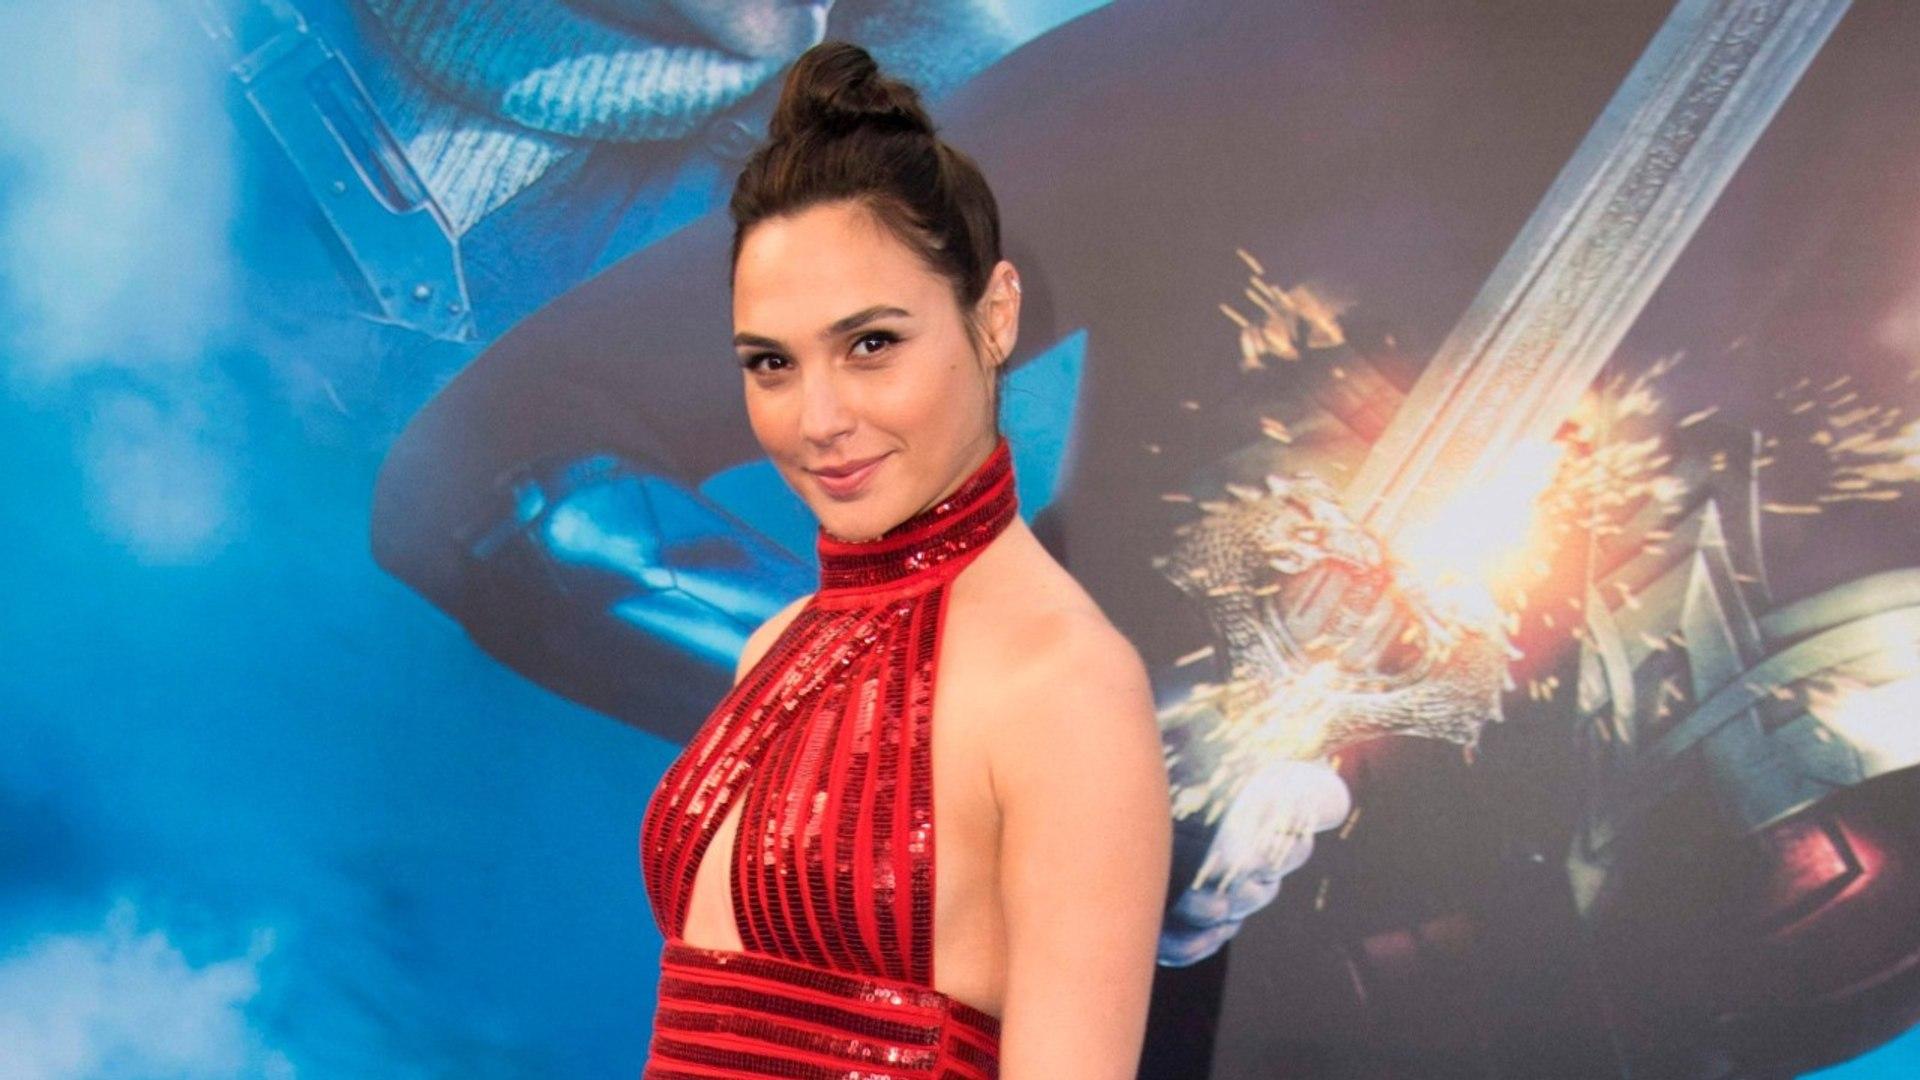 Both Wonder Women Reunite At Premiere